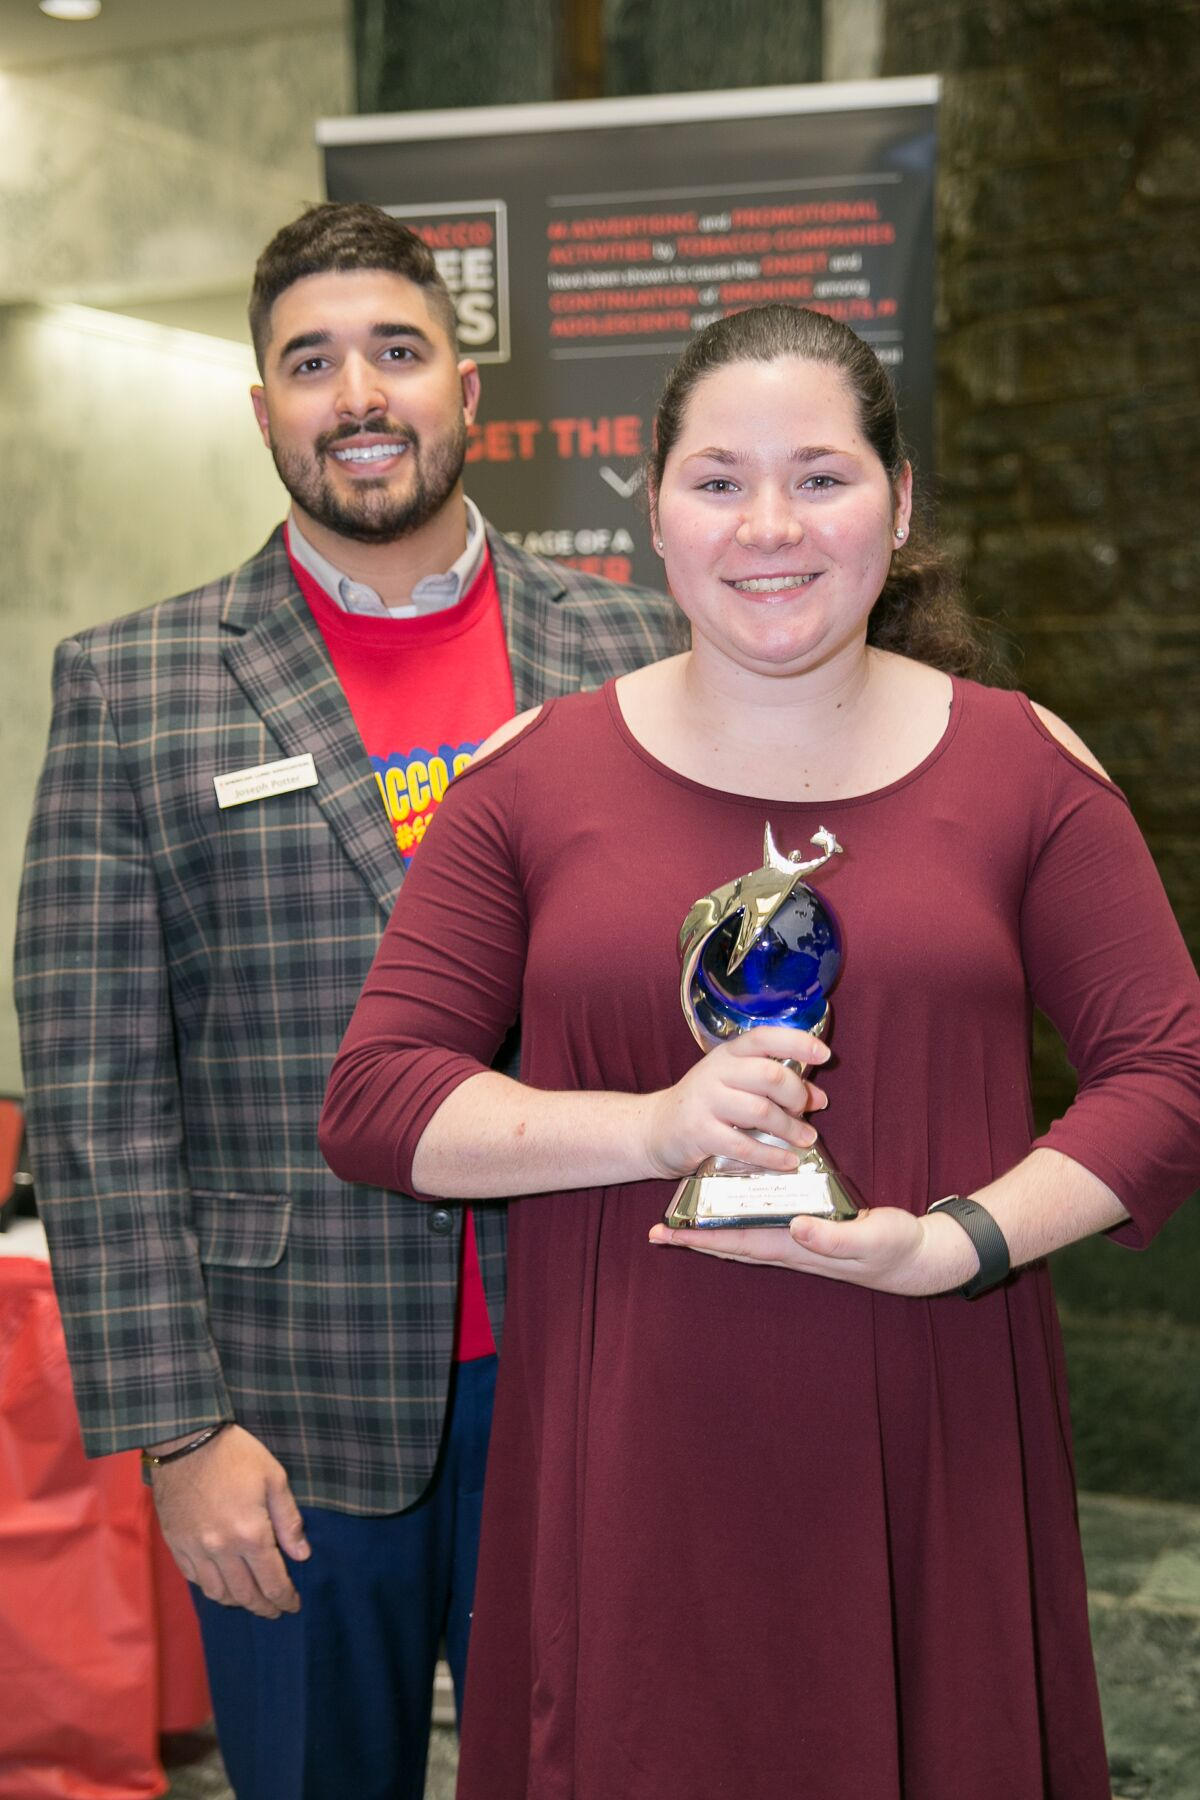 - Reality Check Program Coordinator Joseph Potter with the 2018 State YAYA Winner Lauren Cybul